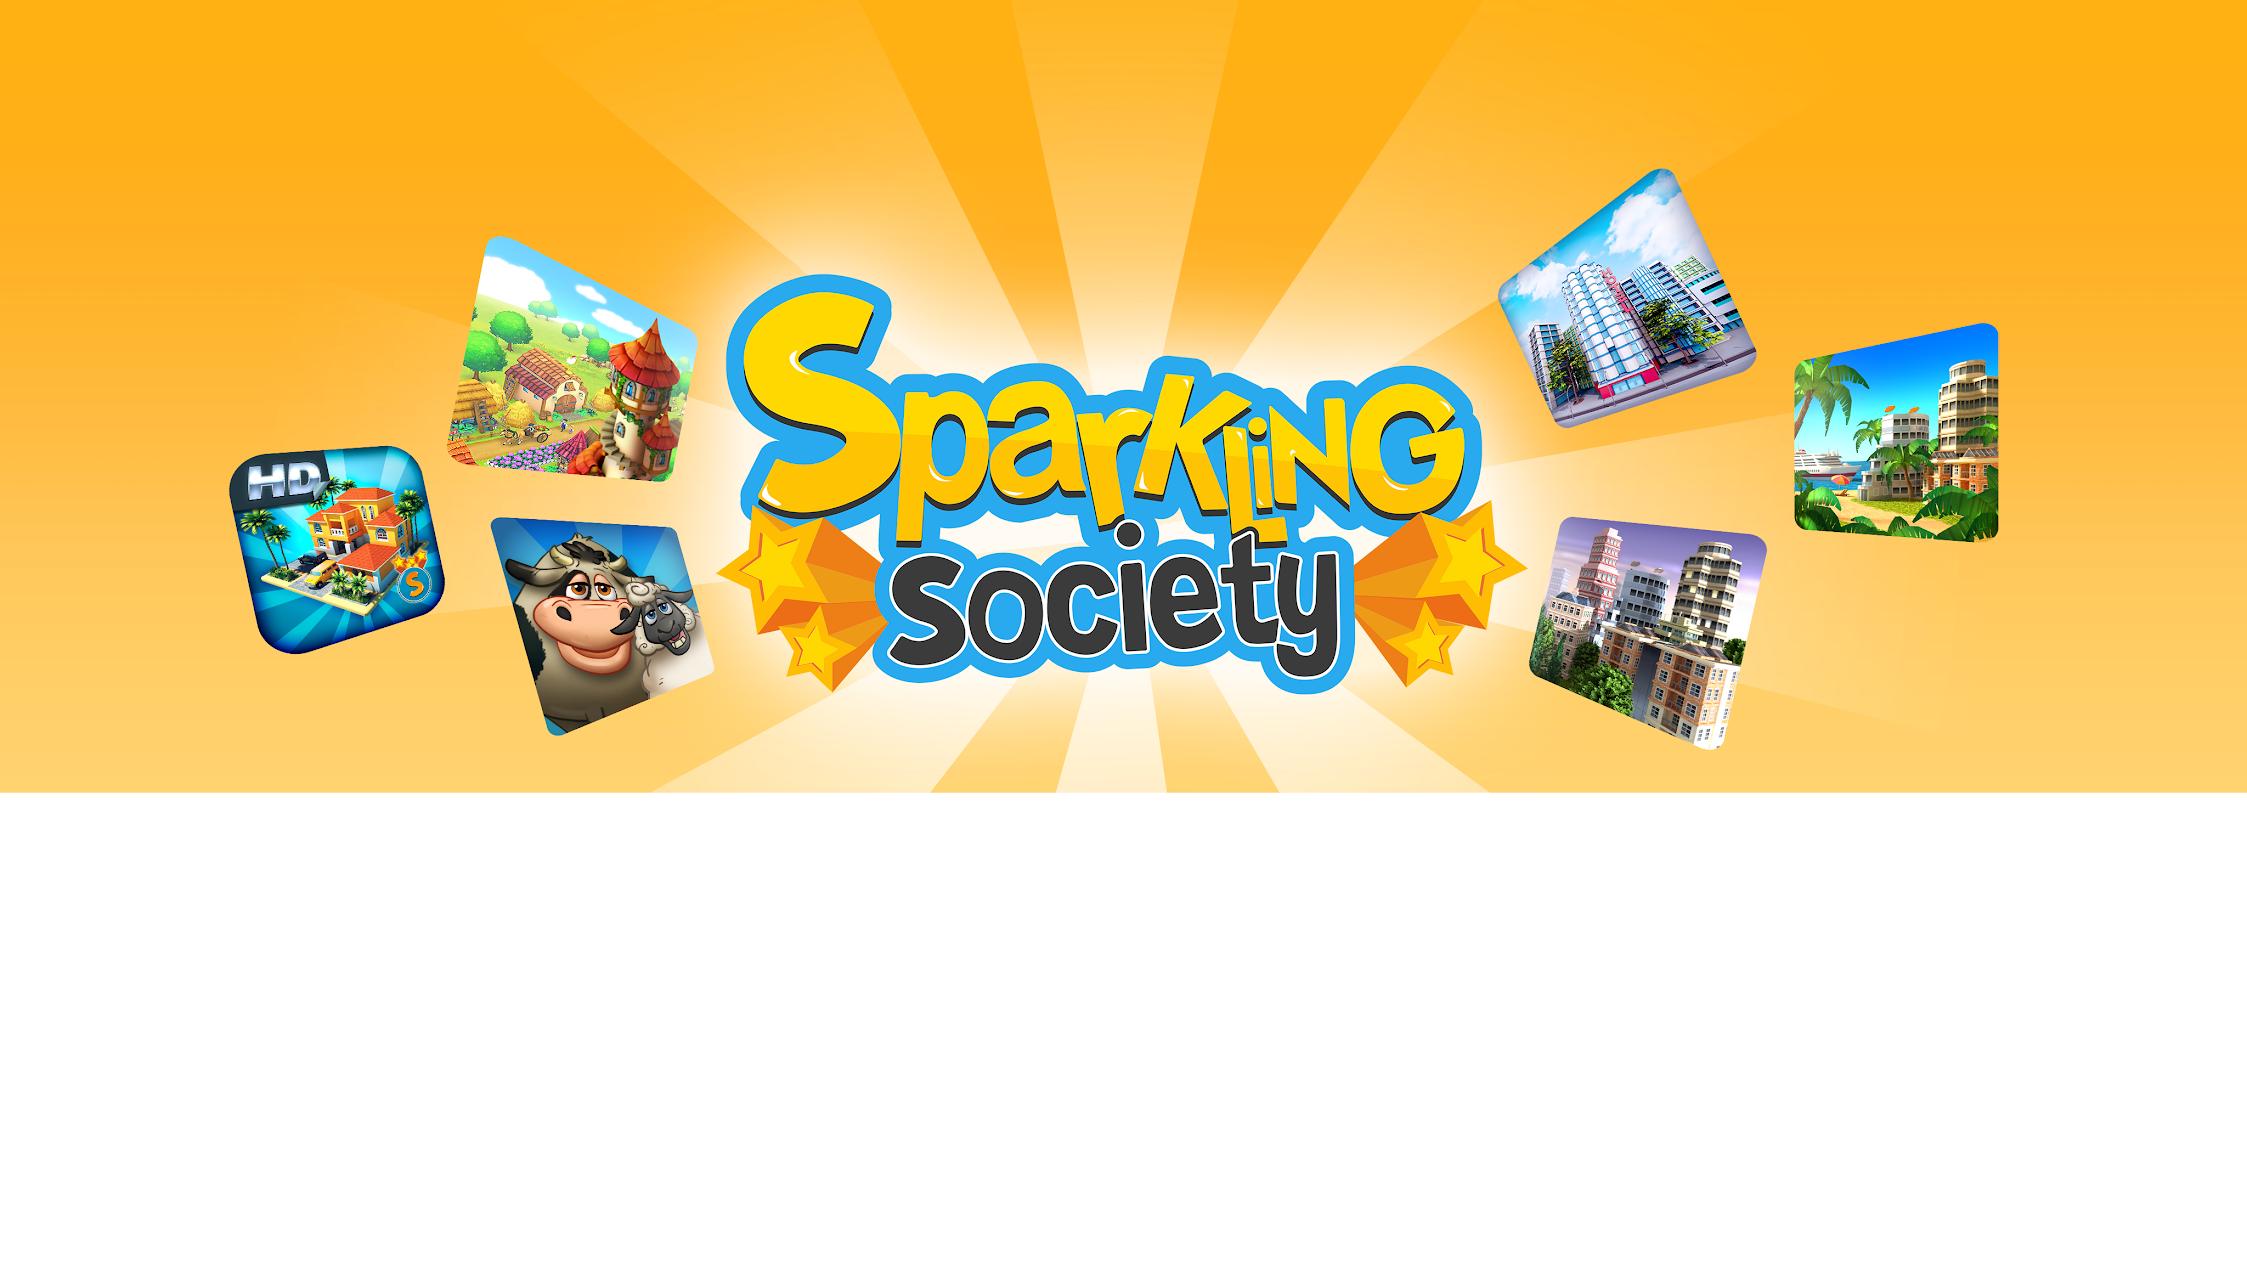 Sparkling Society - Sims Farm Town & CCG/TCG Games